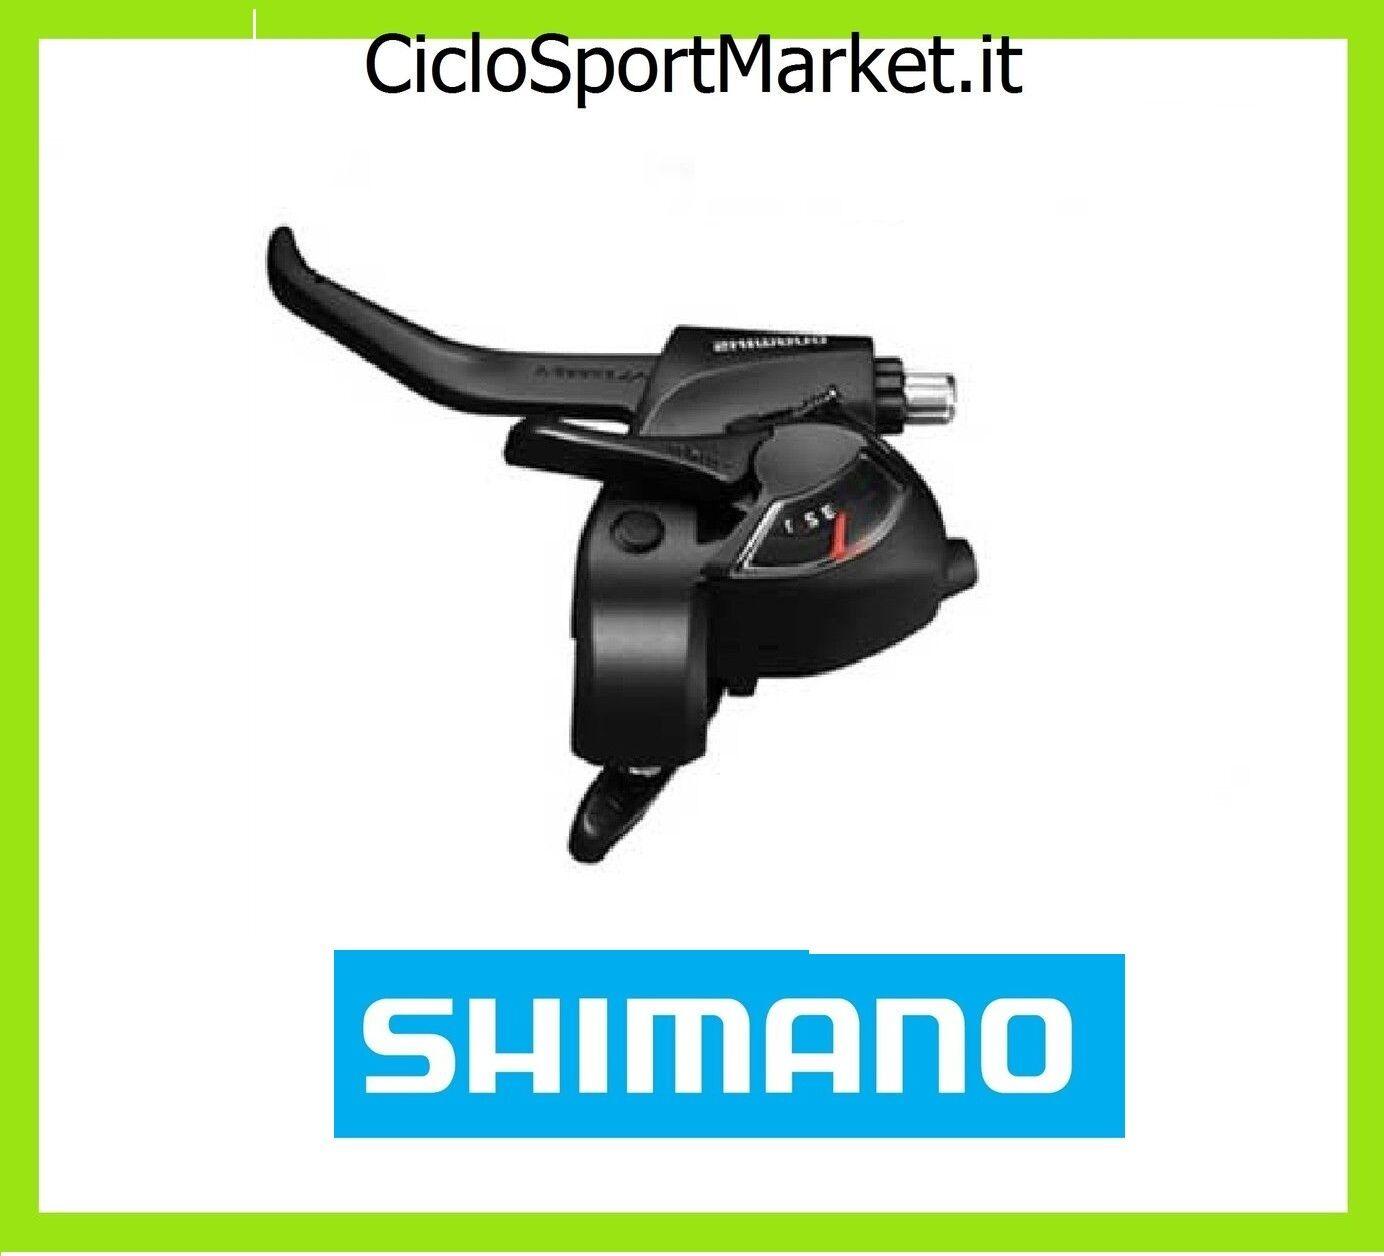 Palanca SHIMANO Comando+Freno 3  Velocidad Cables Cambio incluido bici MTB  fast delivery and free shipping on all orders